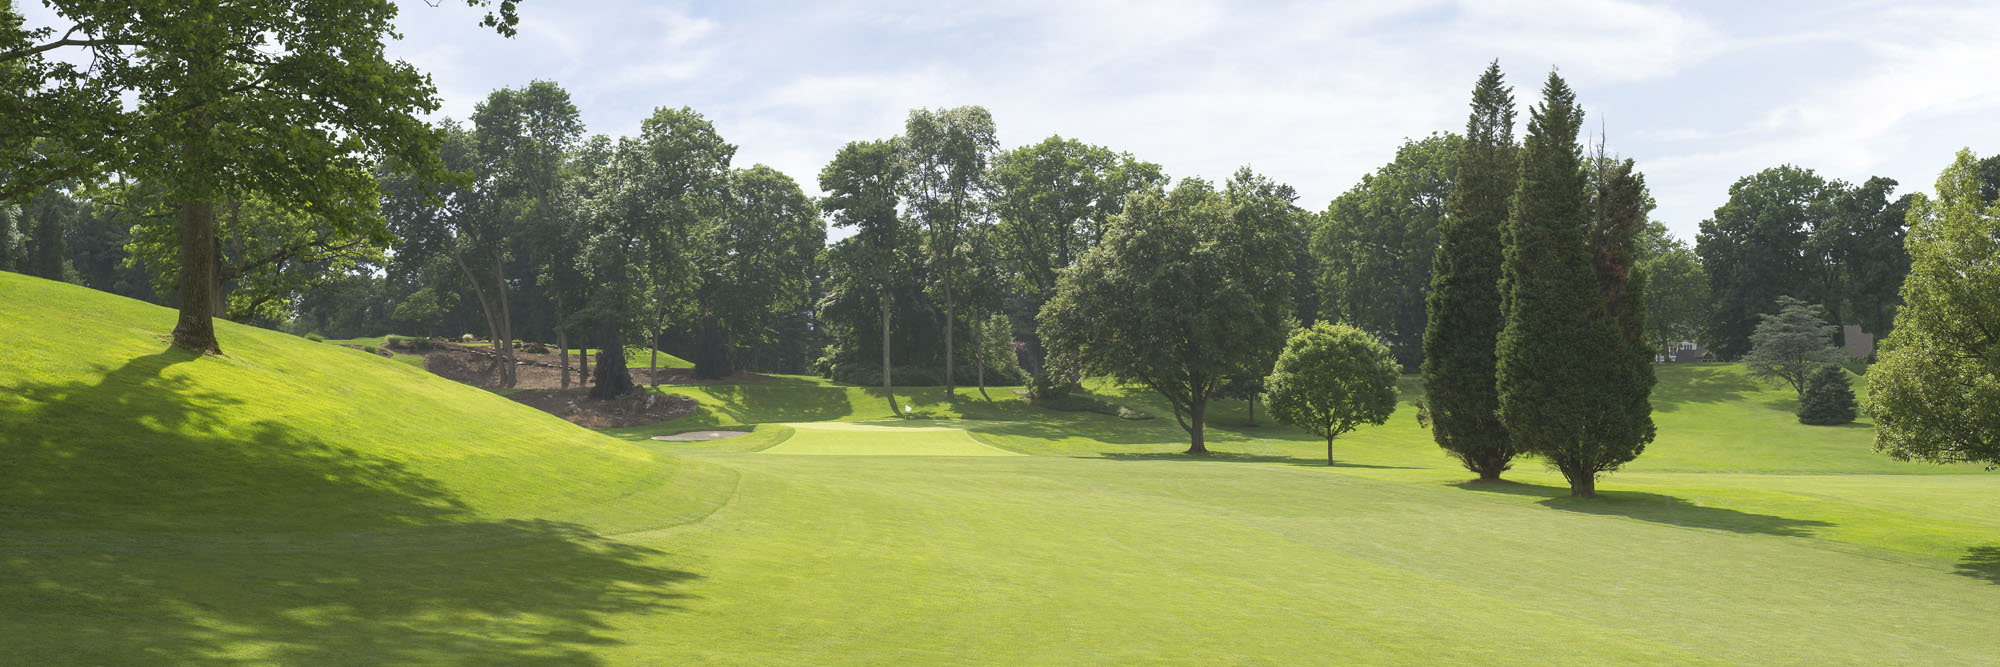 Golf Course Image - Berkshire No. 5